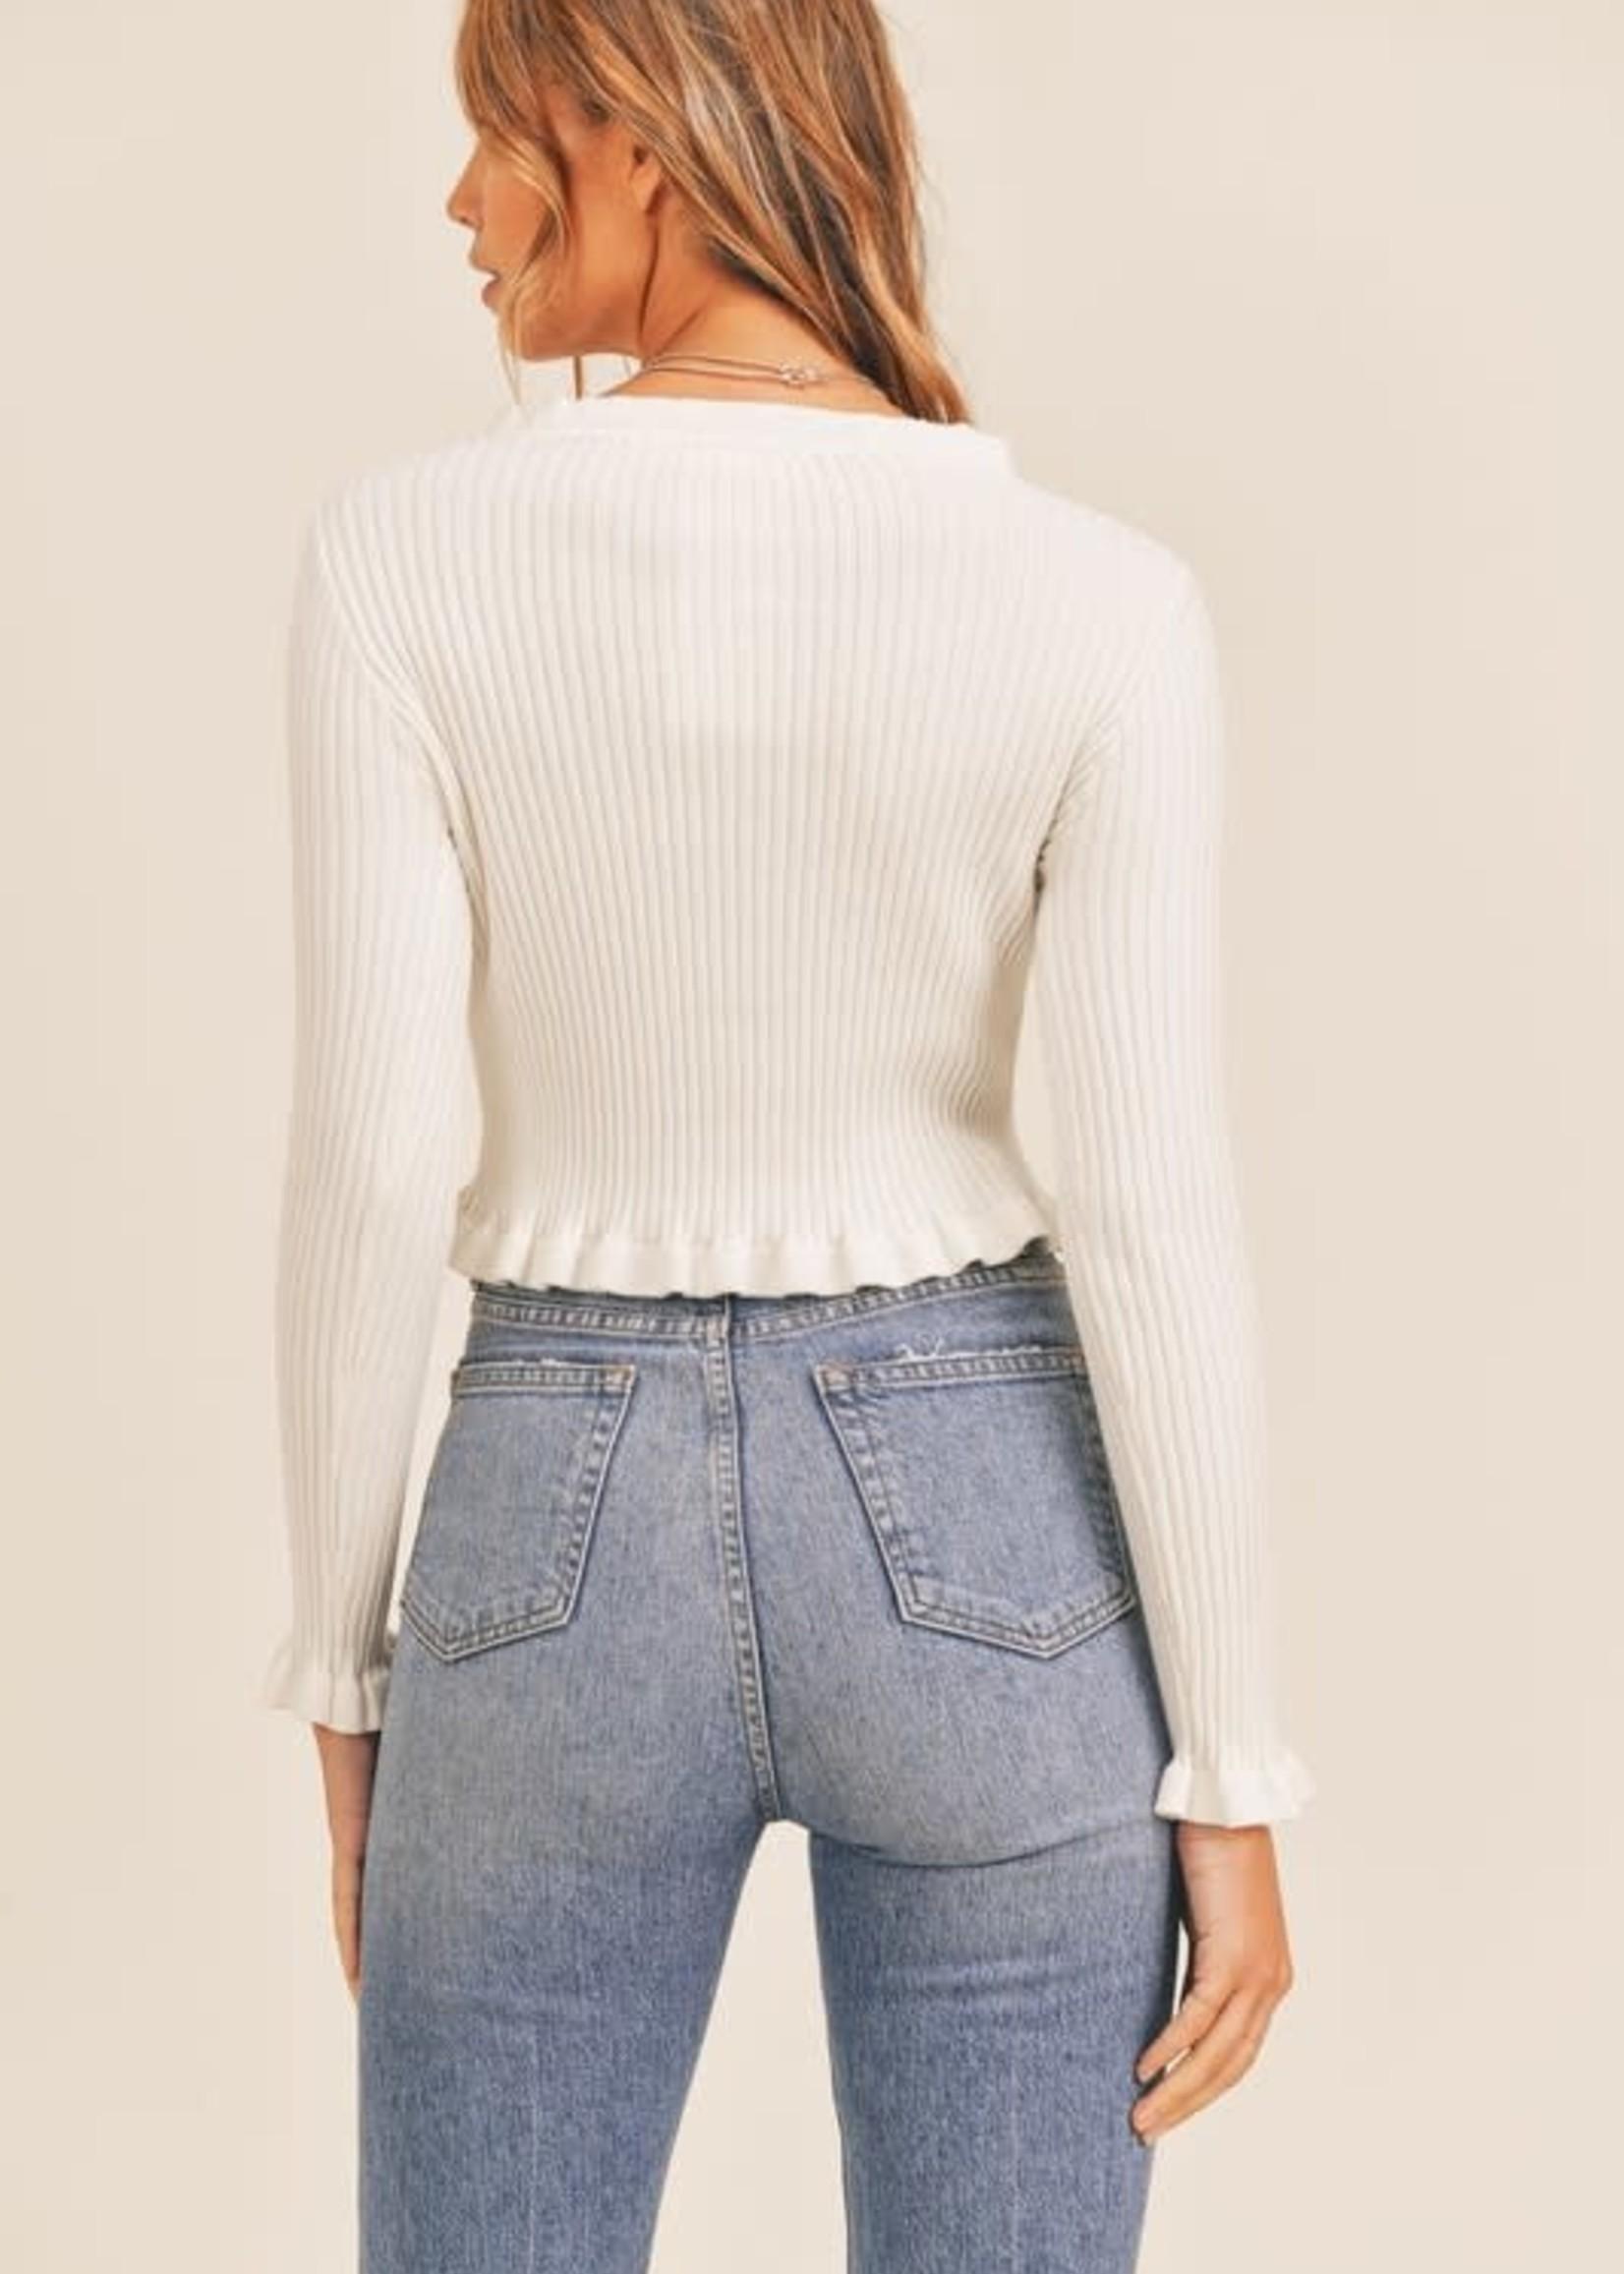 Ruffle Detail Ivory Sweater